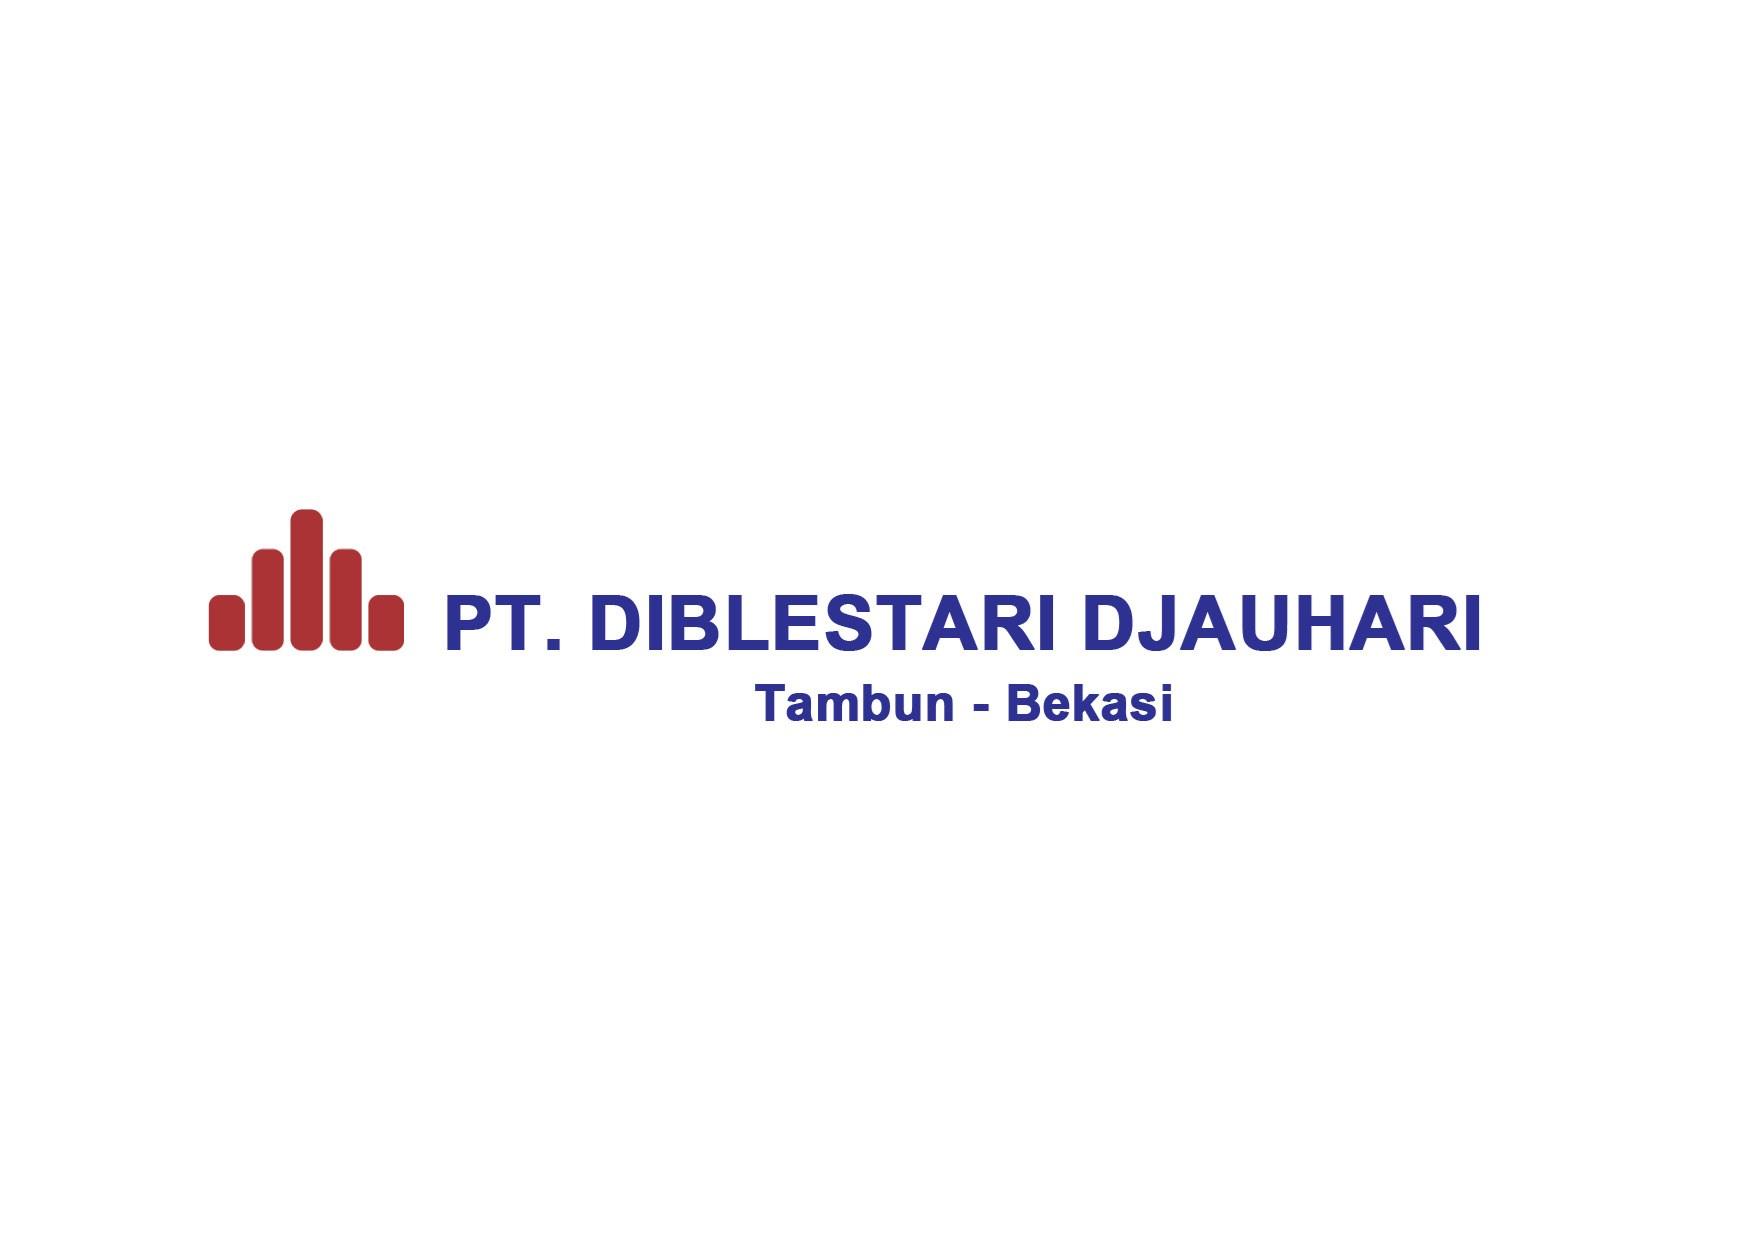 Logo PT. Diblestari Djauhari